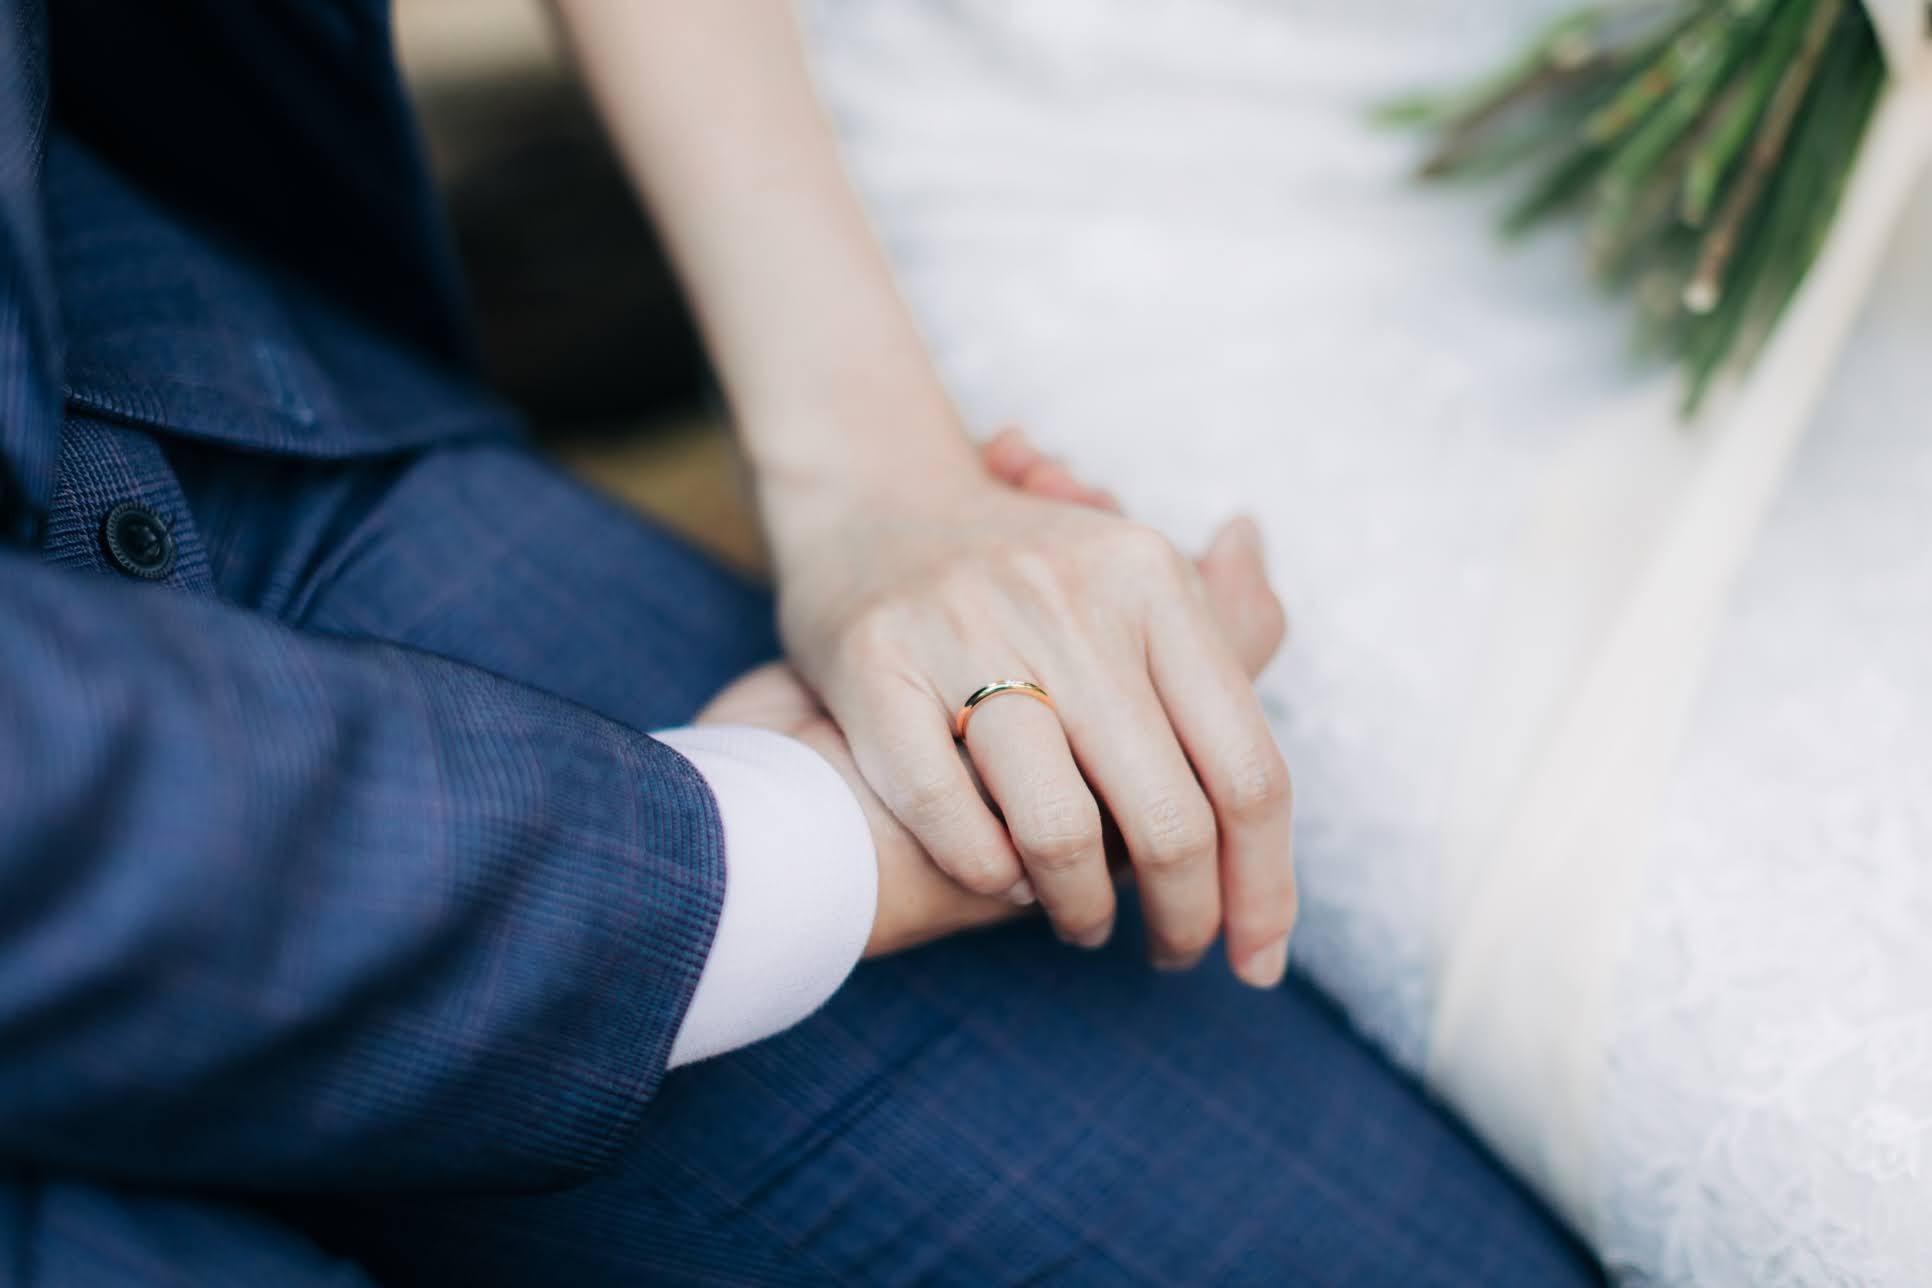 秘密花園婚紗 | Dennis + Felicia Engagement | 優雅簡約美式逐光婚紗